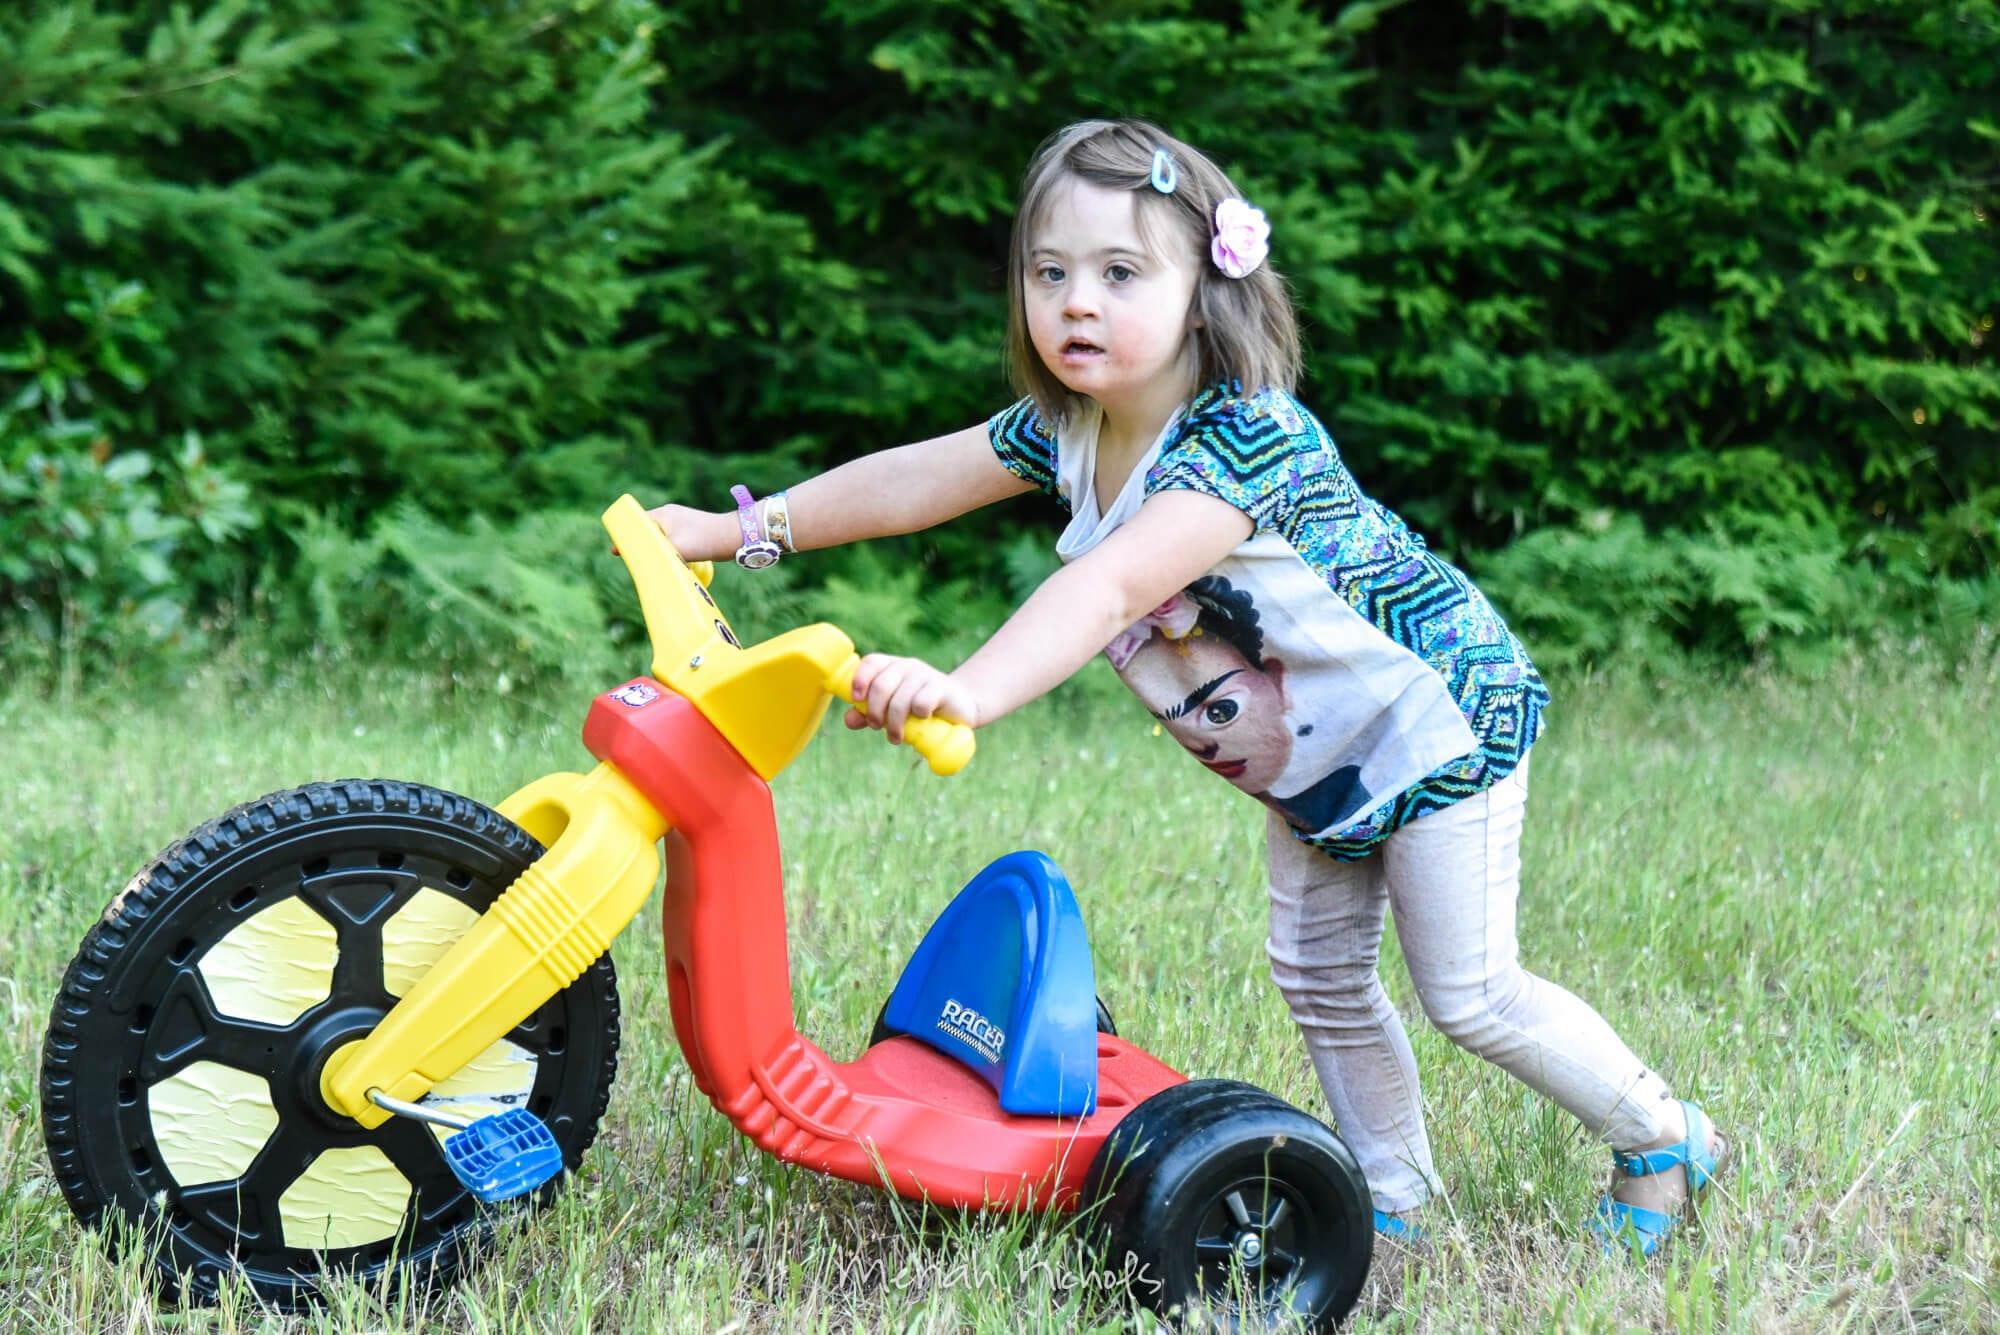 Moxie's Big Wheel Ride